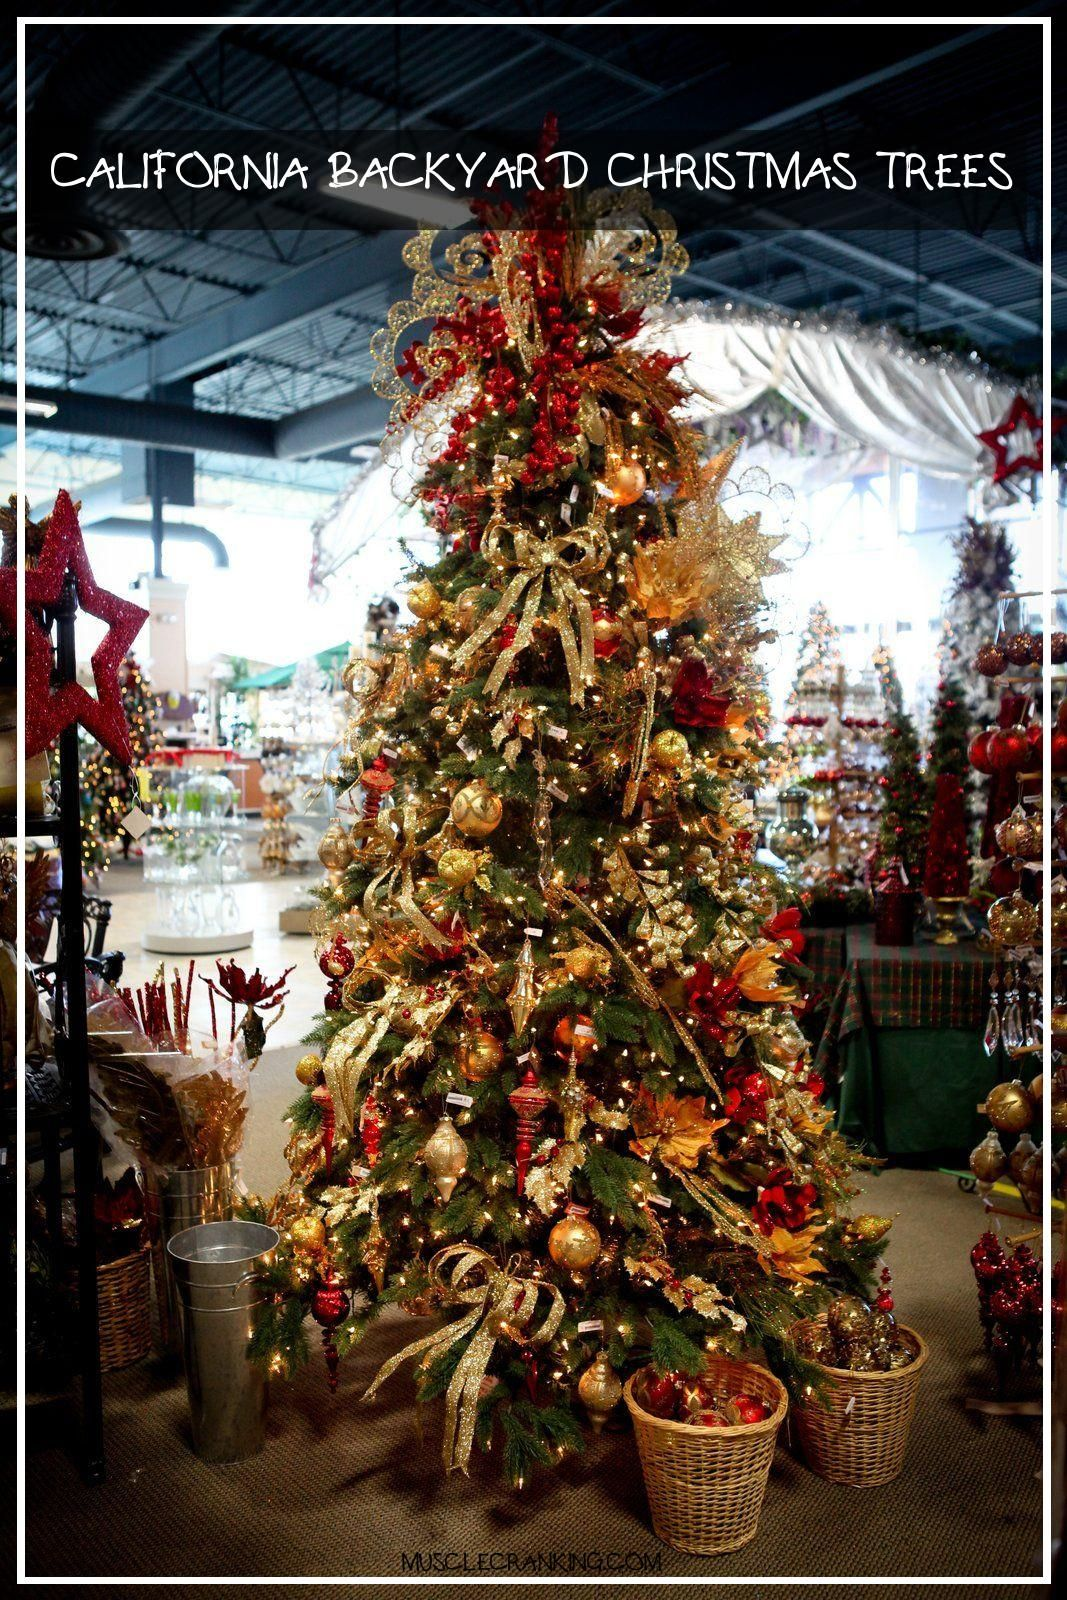 California Backyard Christmas Trees 2021 di 2020